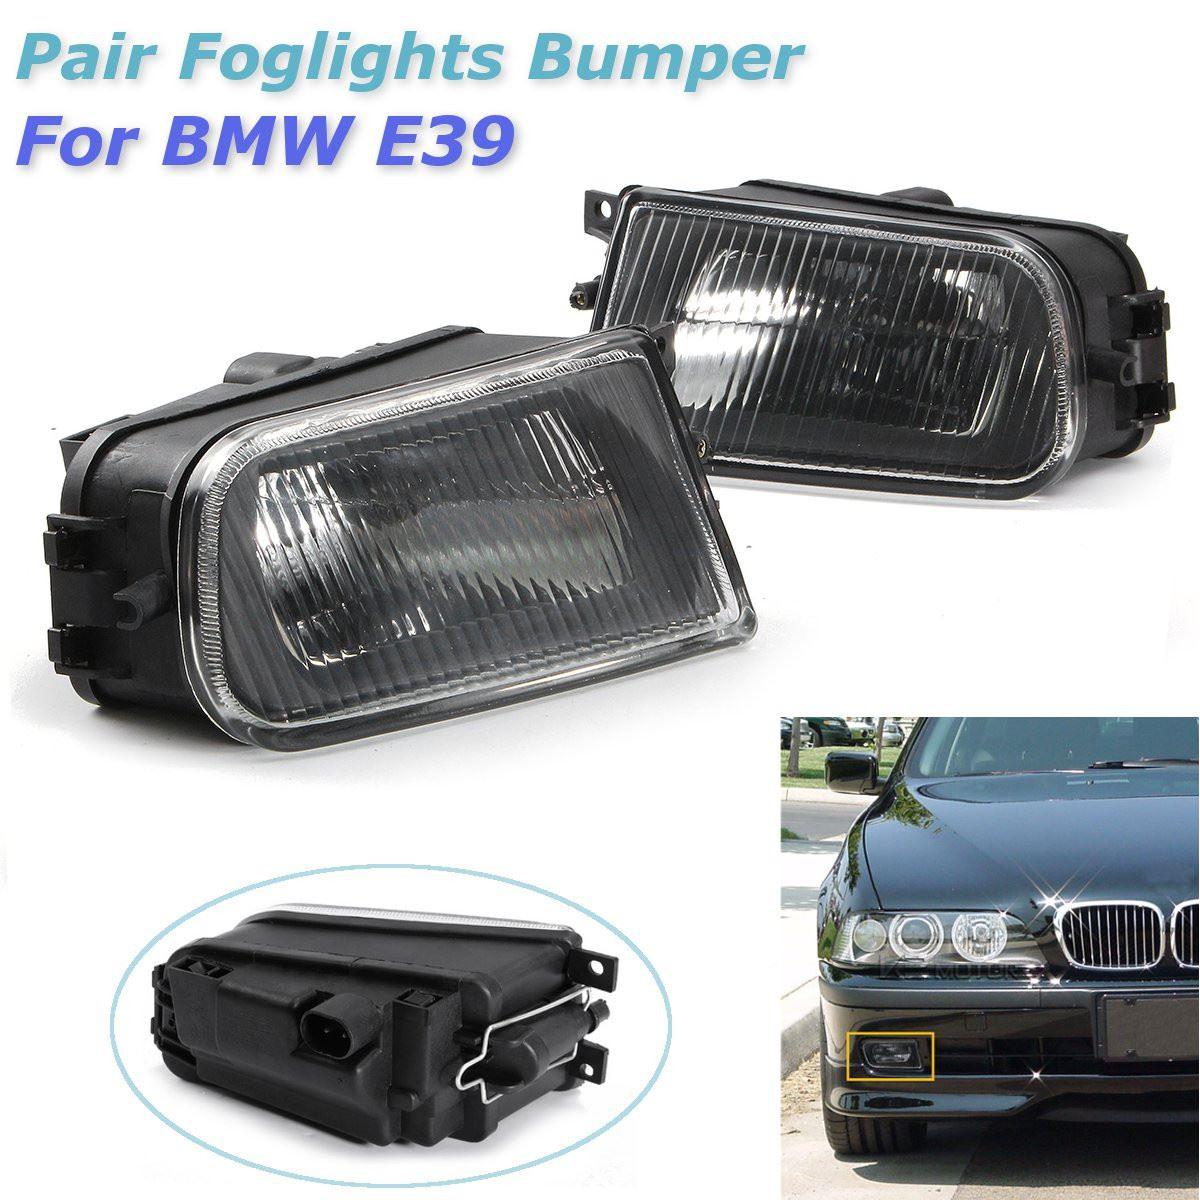 ФОТО 1 Pair Left/Right Black Fog Lights Bumper Lamp Housing for BMW E39 5-Series 97-00/ Z3 97-01 63178360575 63178381977 63178360576